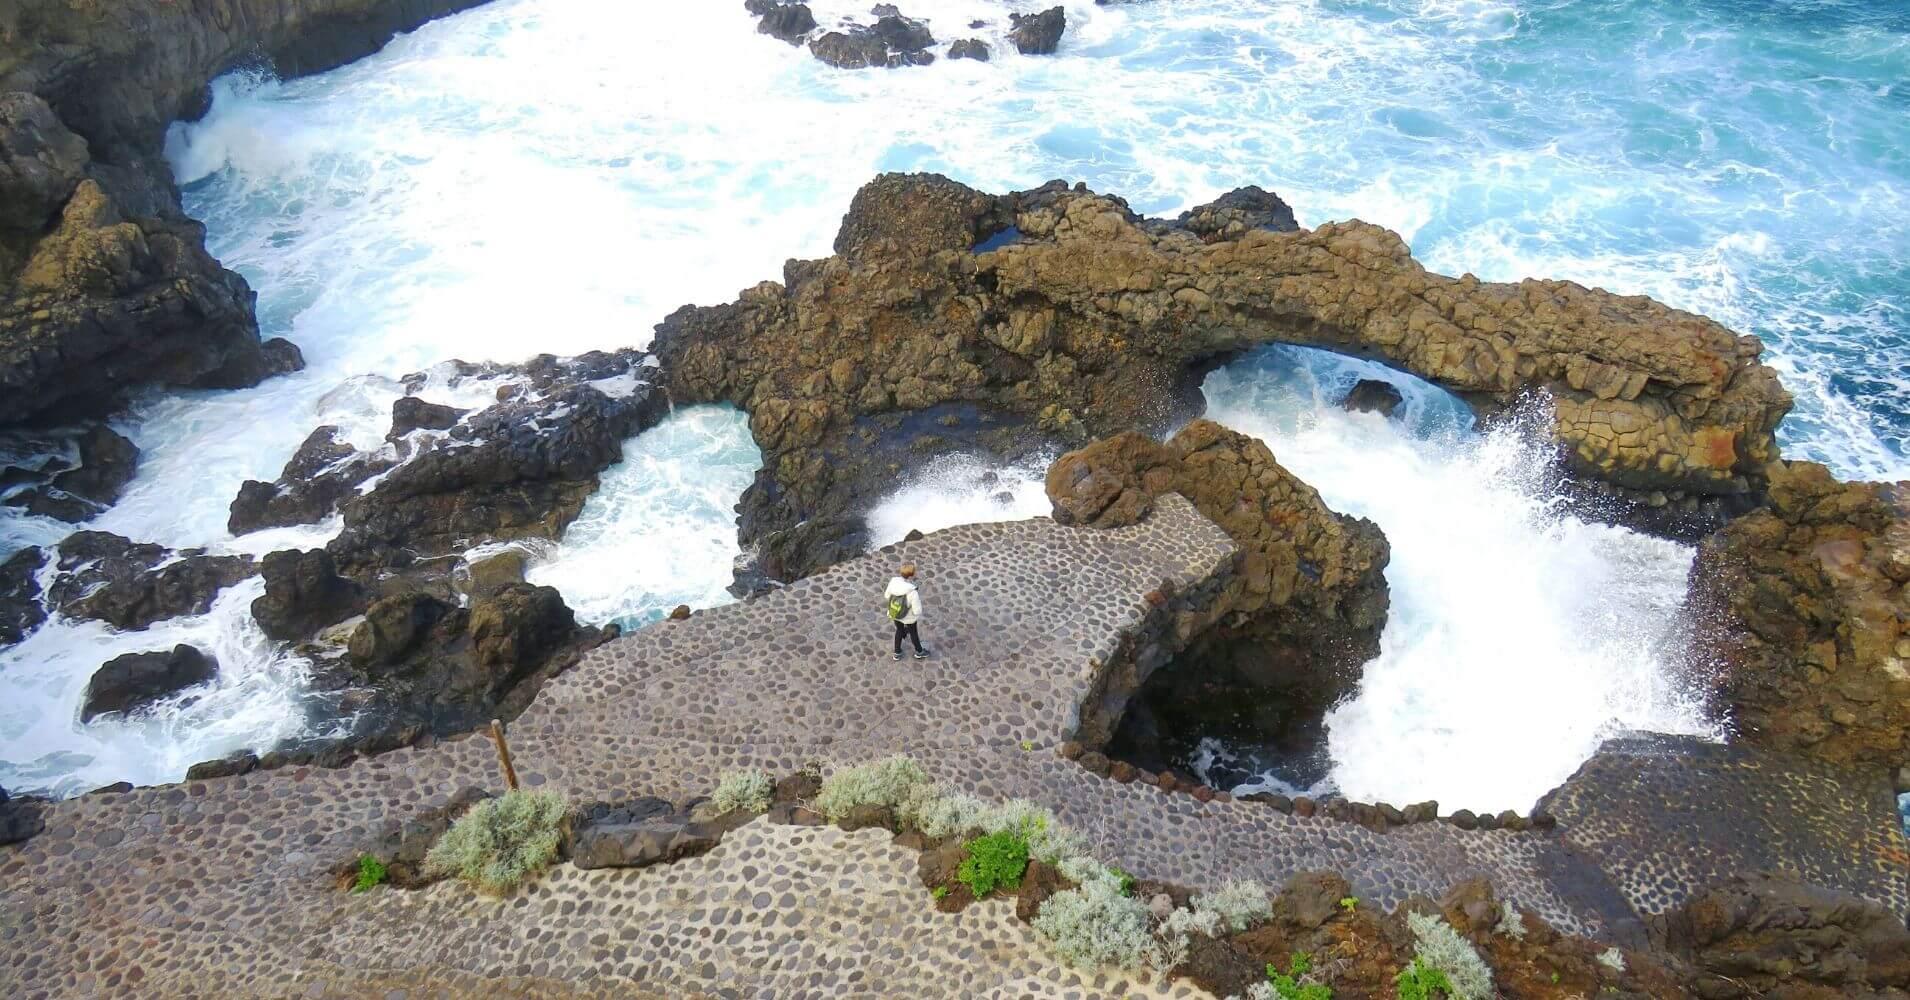 La Fajana. Isla de la Palma en Invierno. Islas Canarias.